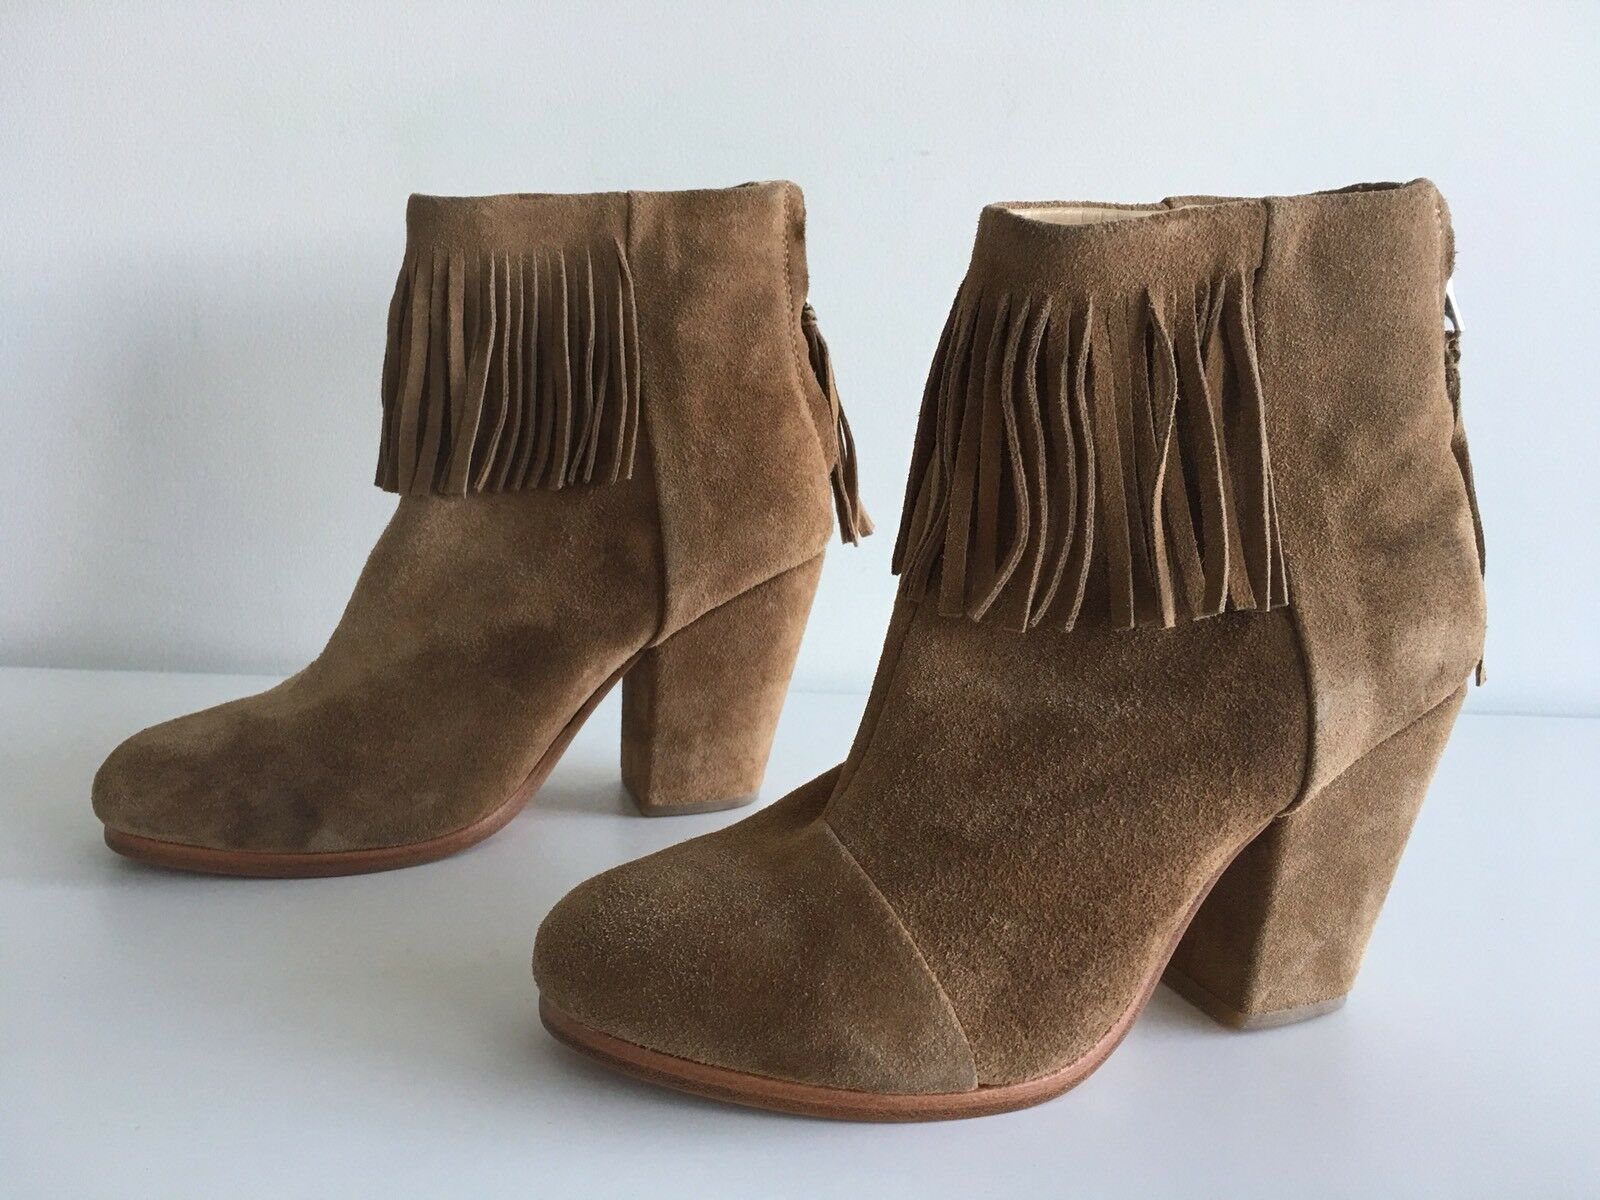 Rag & Bone Newbury flecos de gamuza tobillo tobillo tobillo bota, Camel. Talla 36.5 976c1b